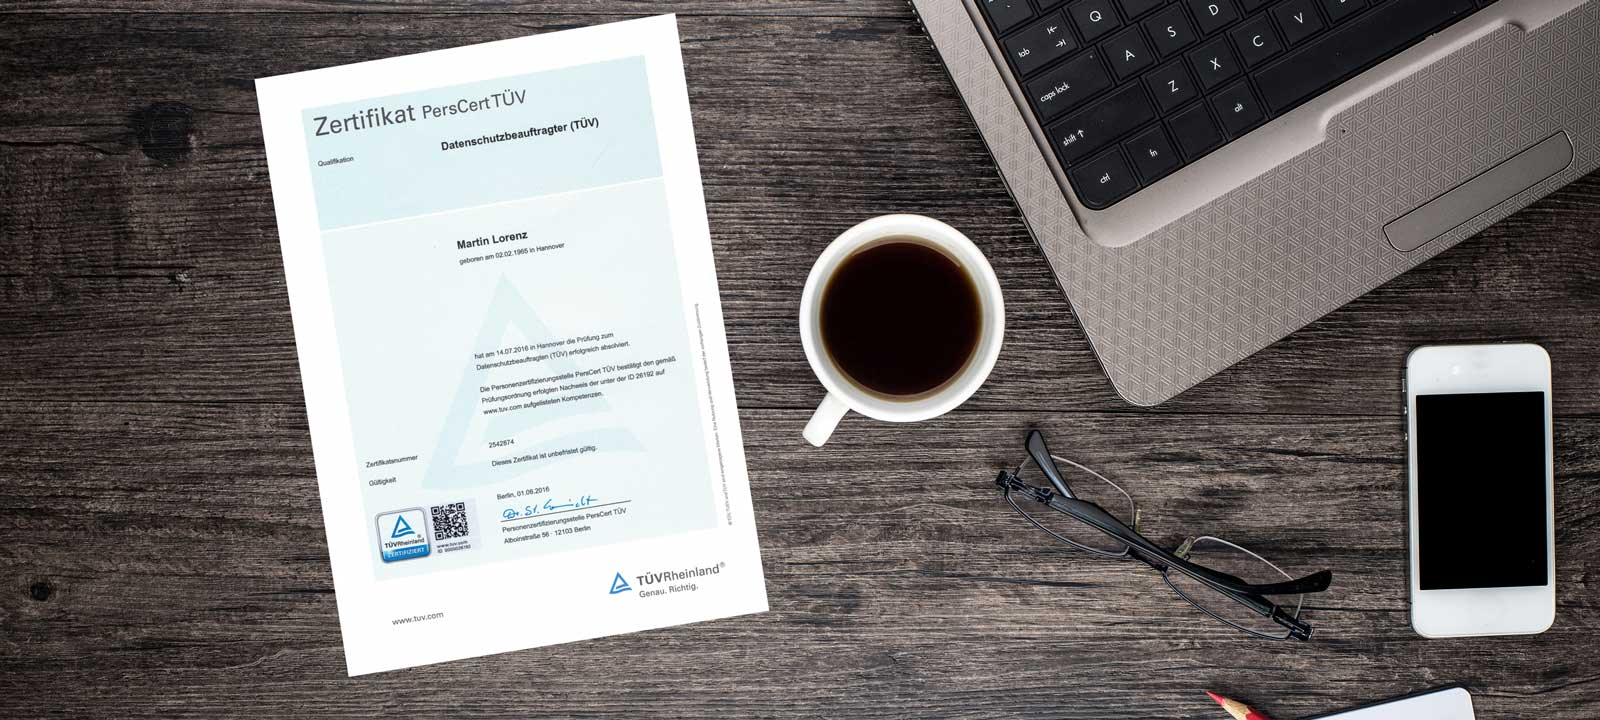 Triades Datenschutz Datensicherheit Zertifikat TÜV Martin Lorenz